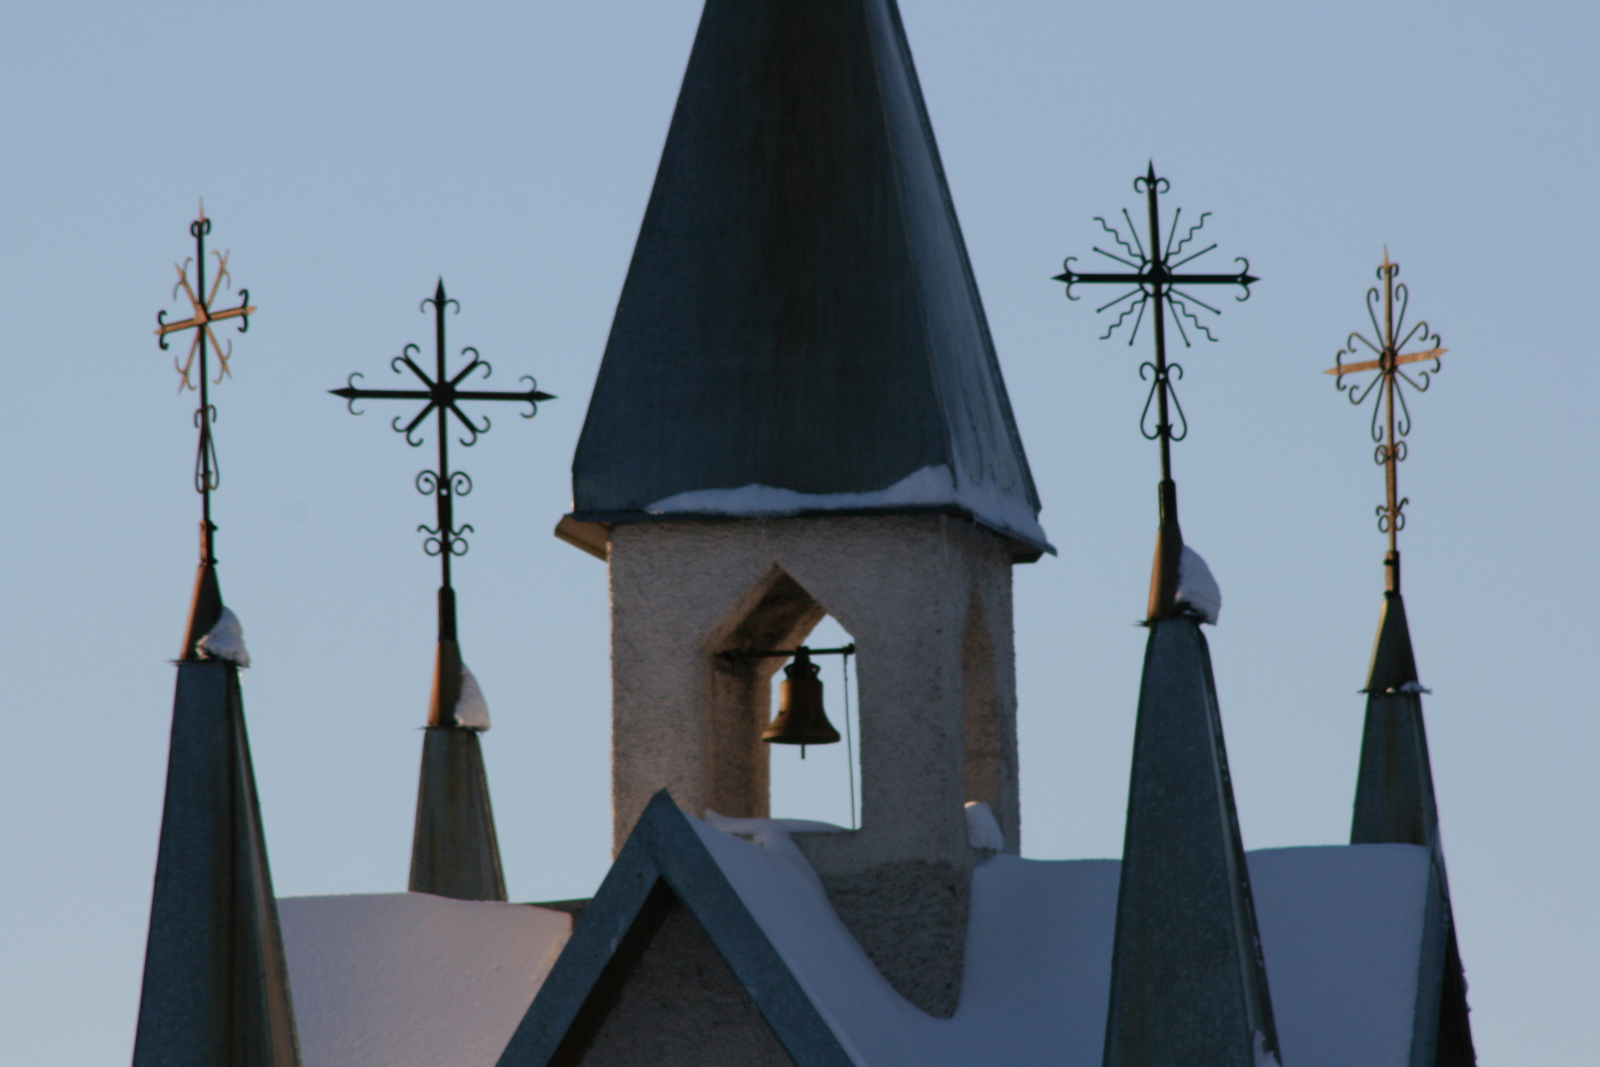 Kryžiai prie bokšto.